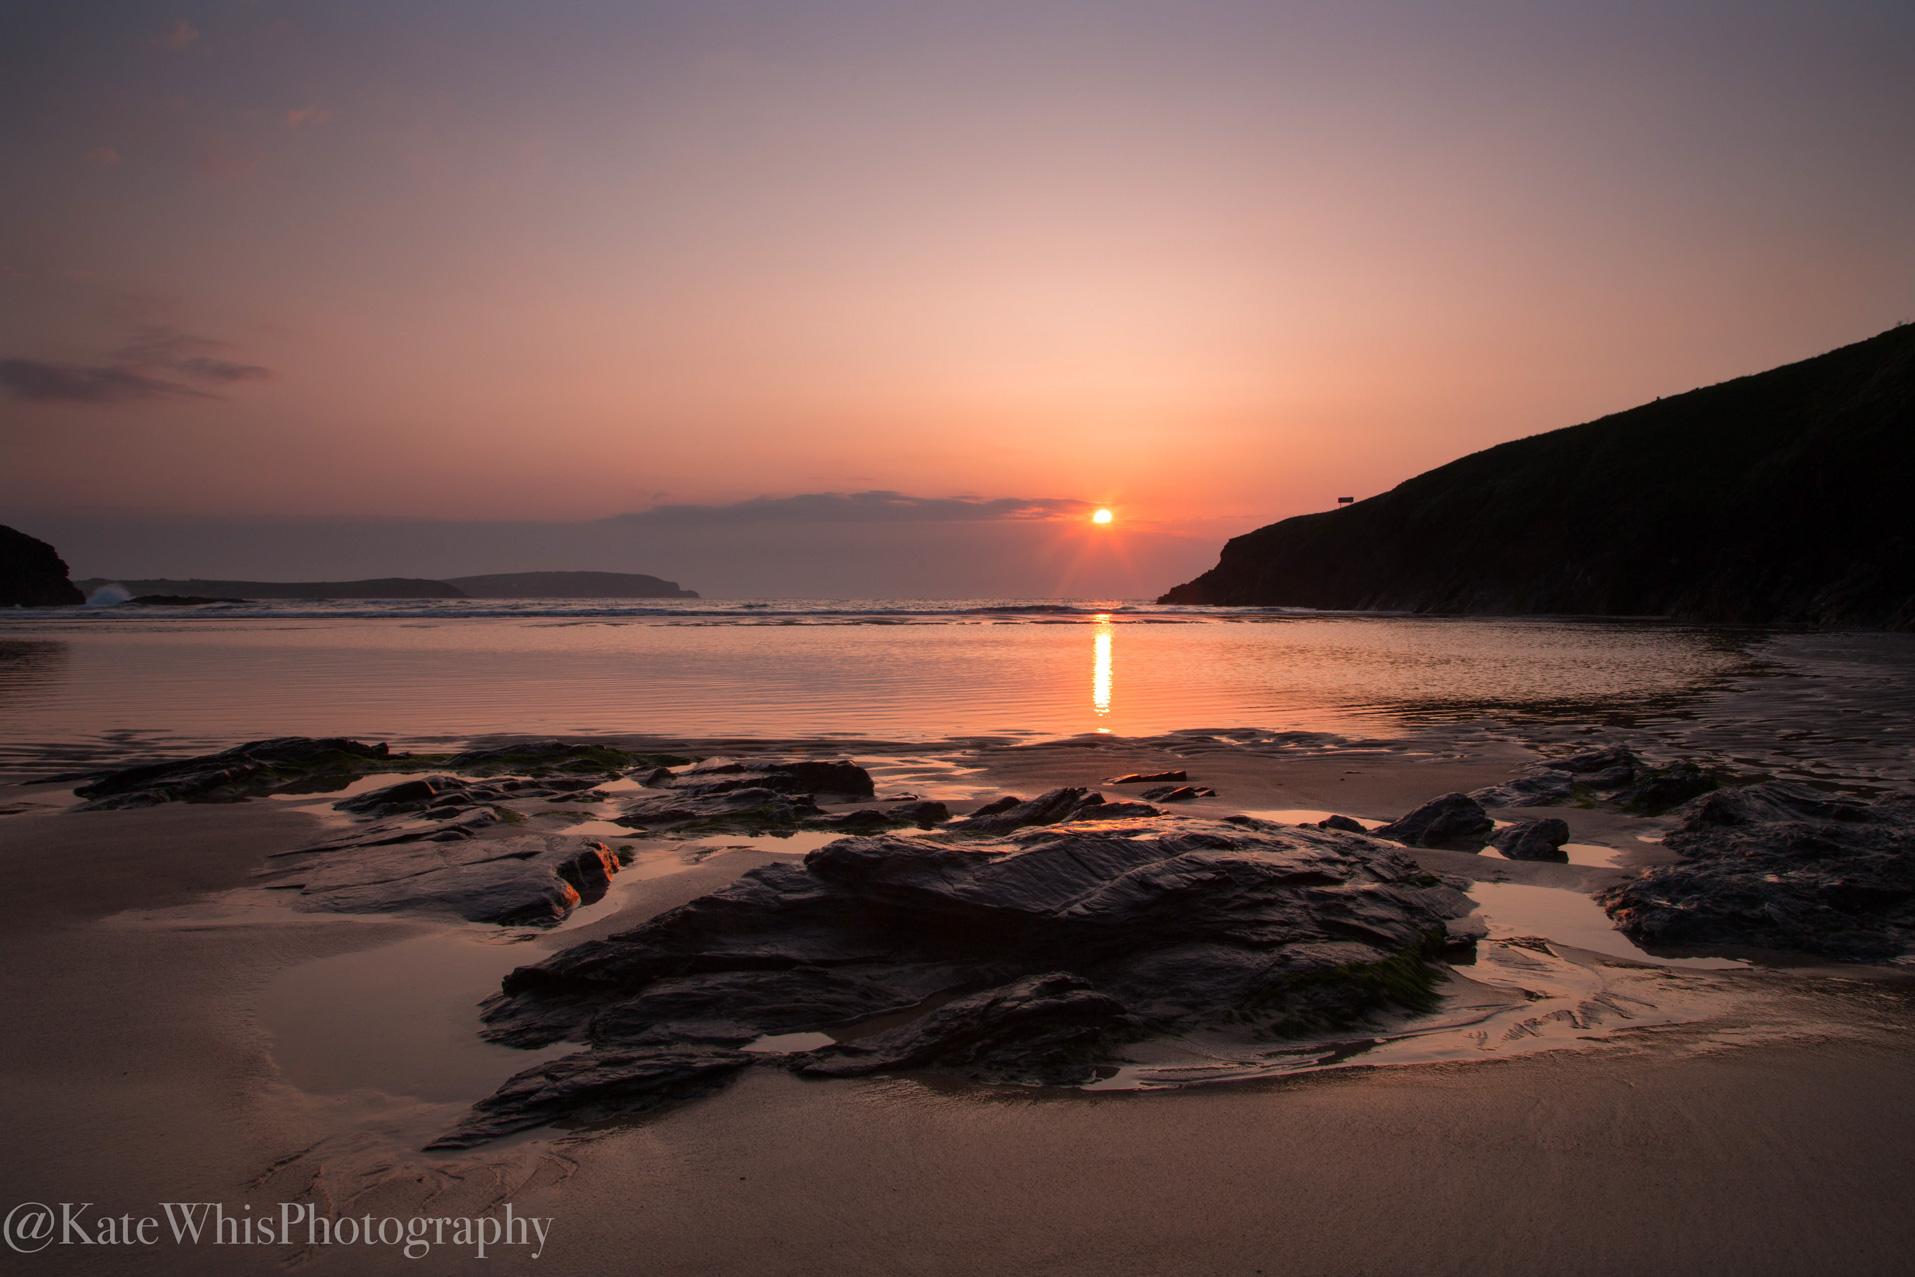 Sunset at Trevone, Cornwall